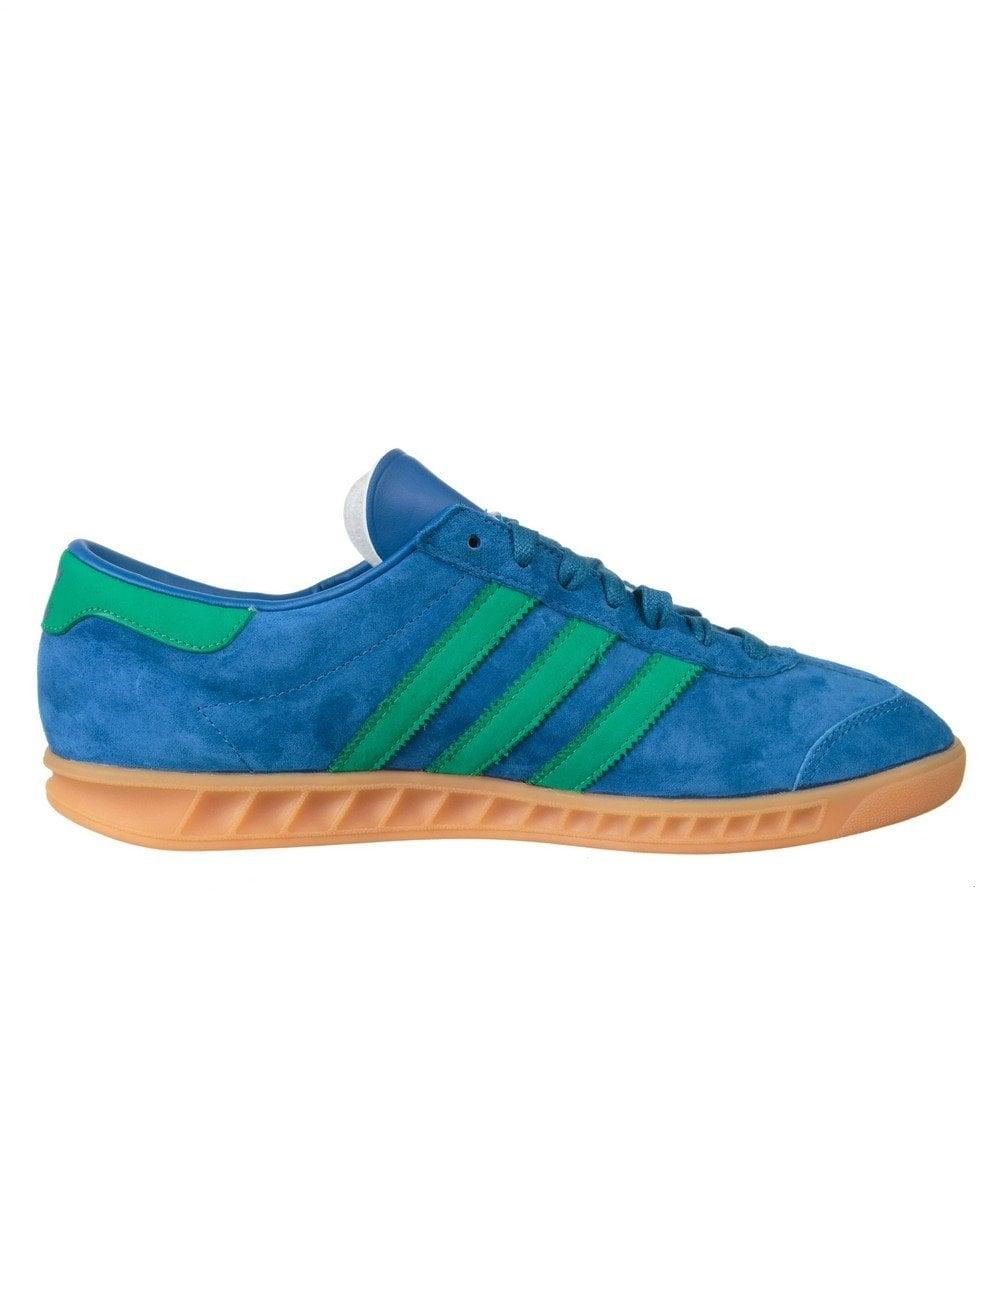 Hamburg Shoes - Lush Blue/Fresh Green